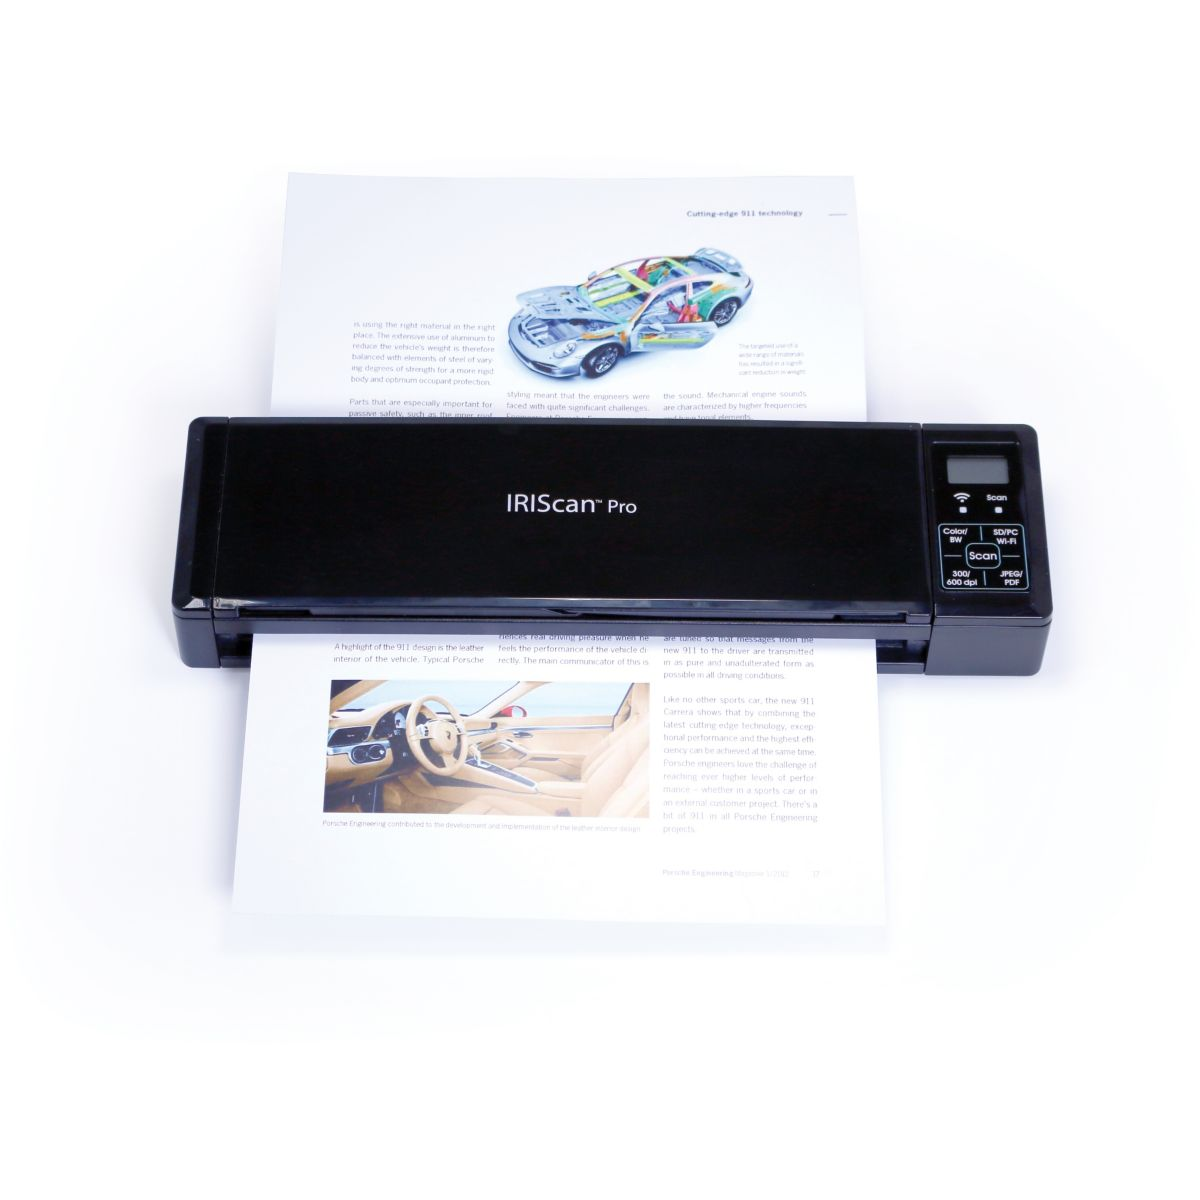 Scanner portable iris irisscan pro 3 wifi - livraison offerte : code liv (photo)